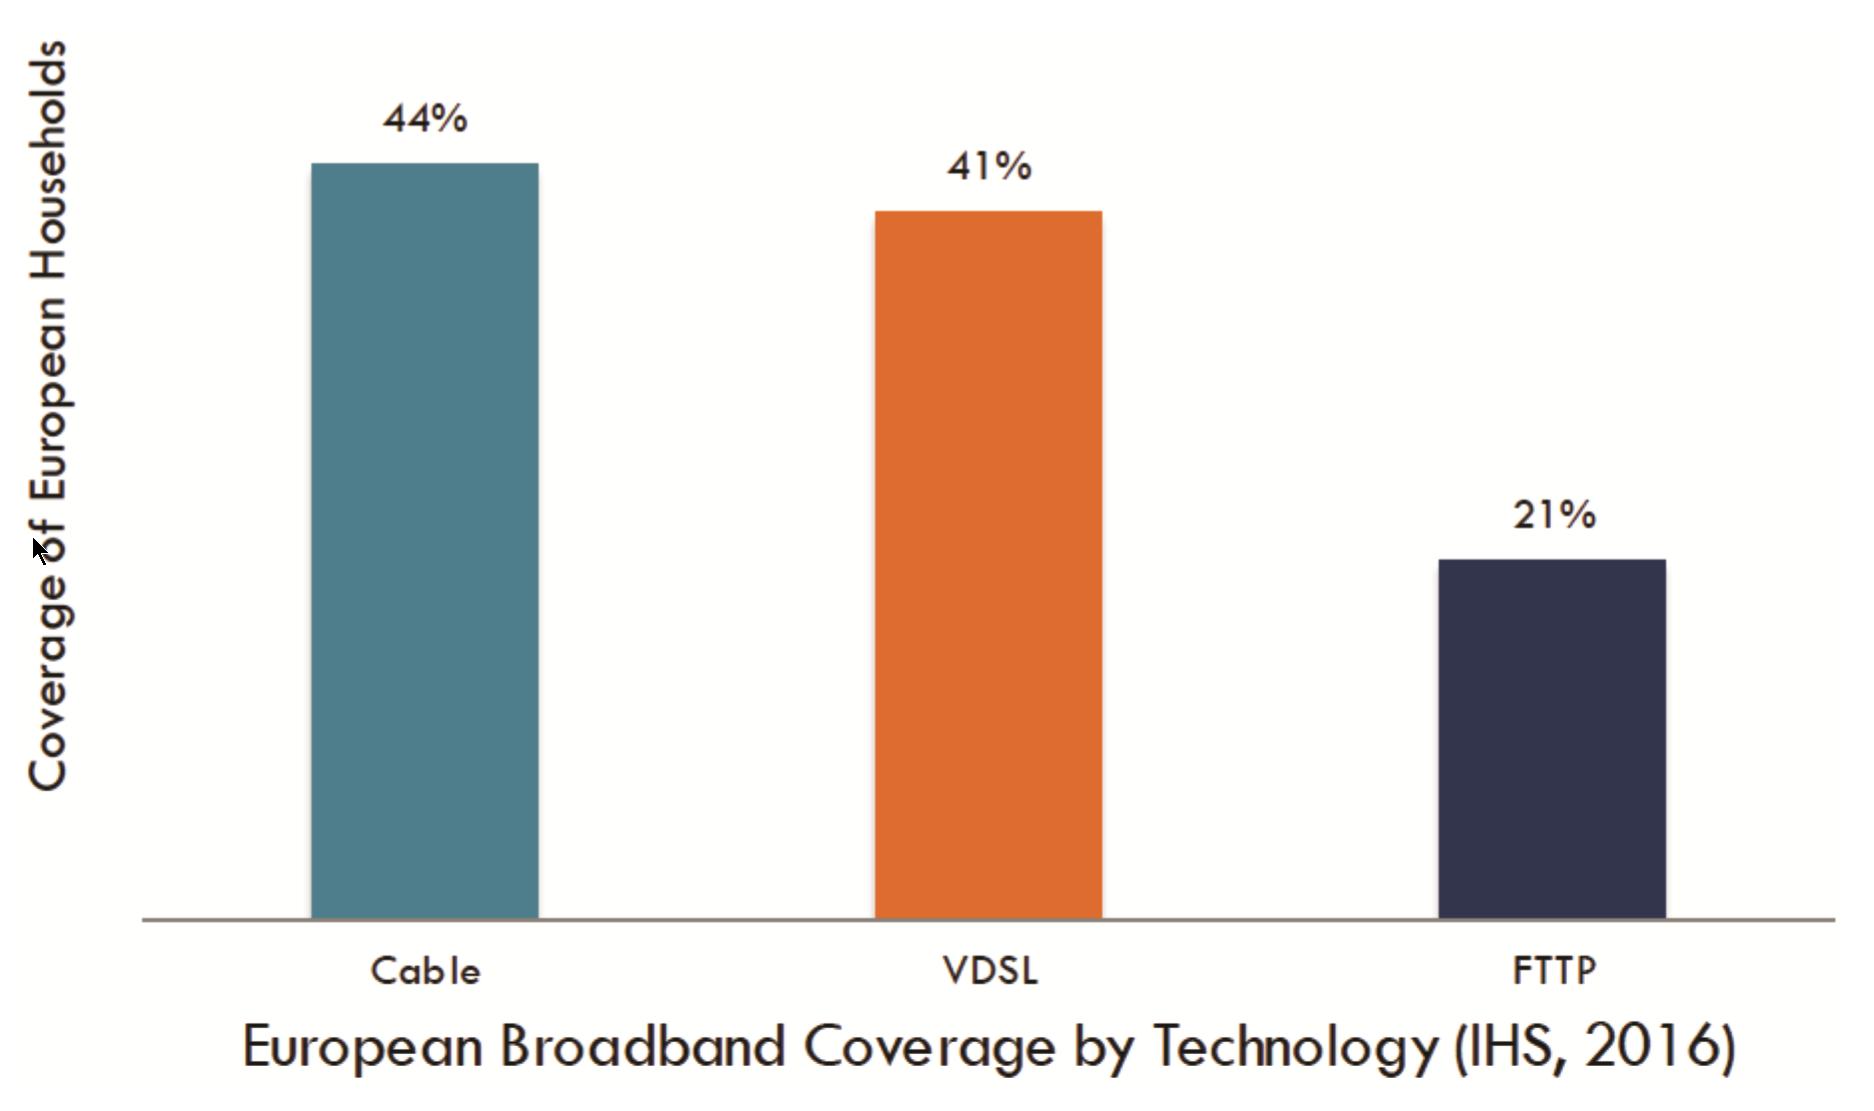 Cable Broadband Technology Gigabit Evolution - CableLabs